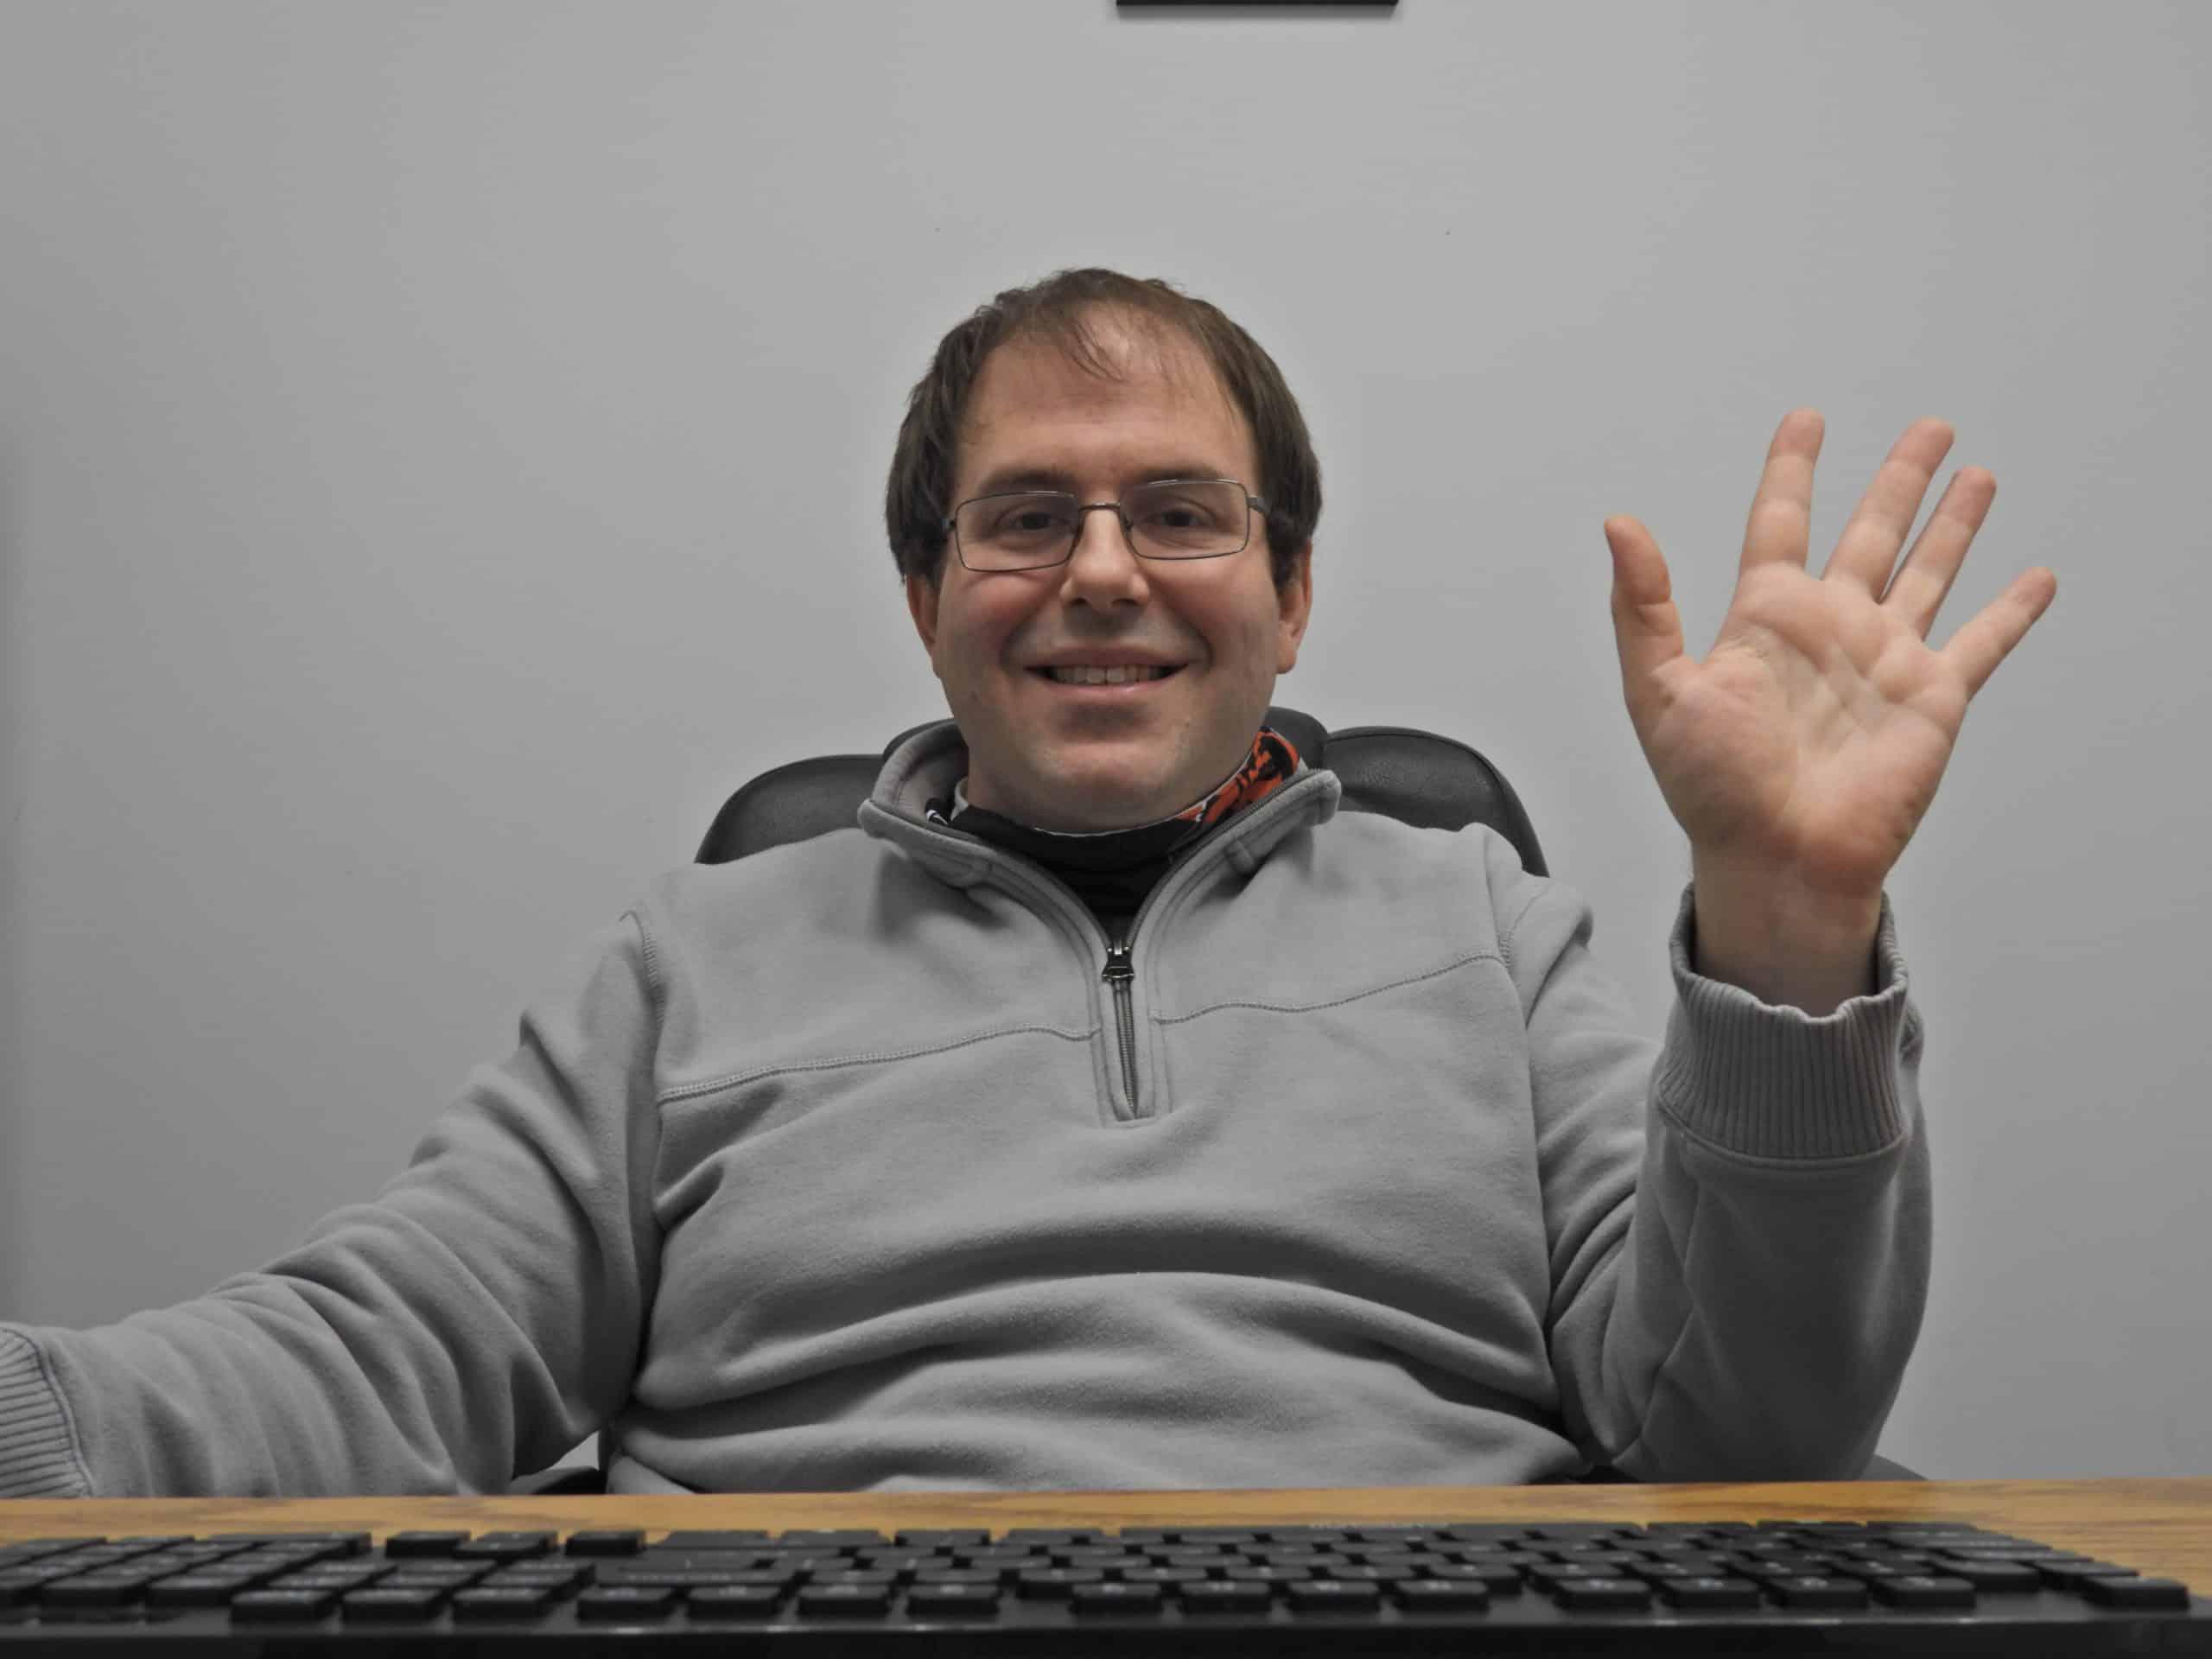 Nick Zeppetello of Zepps Computer Services